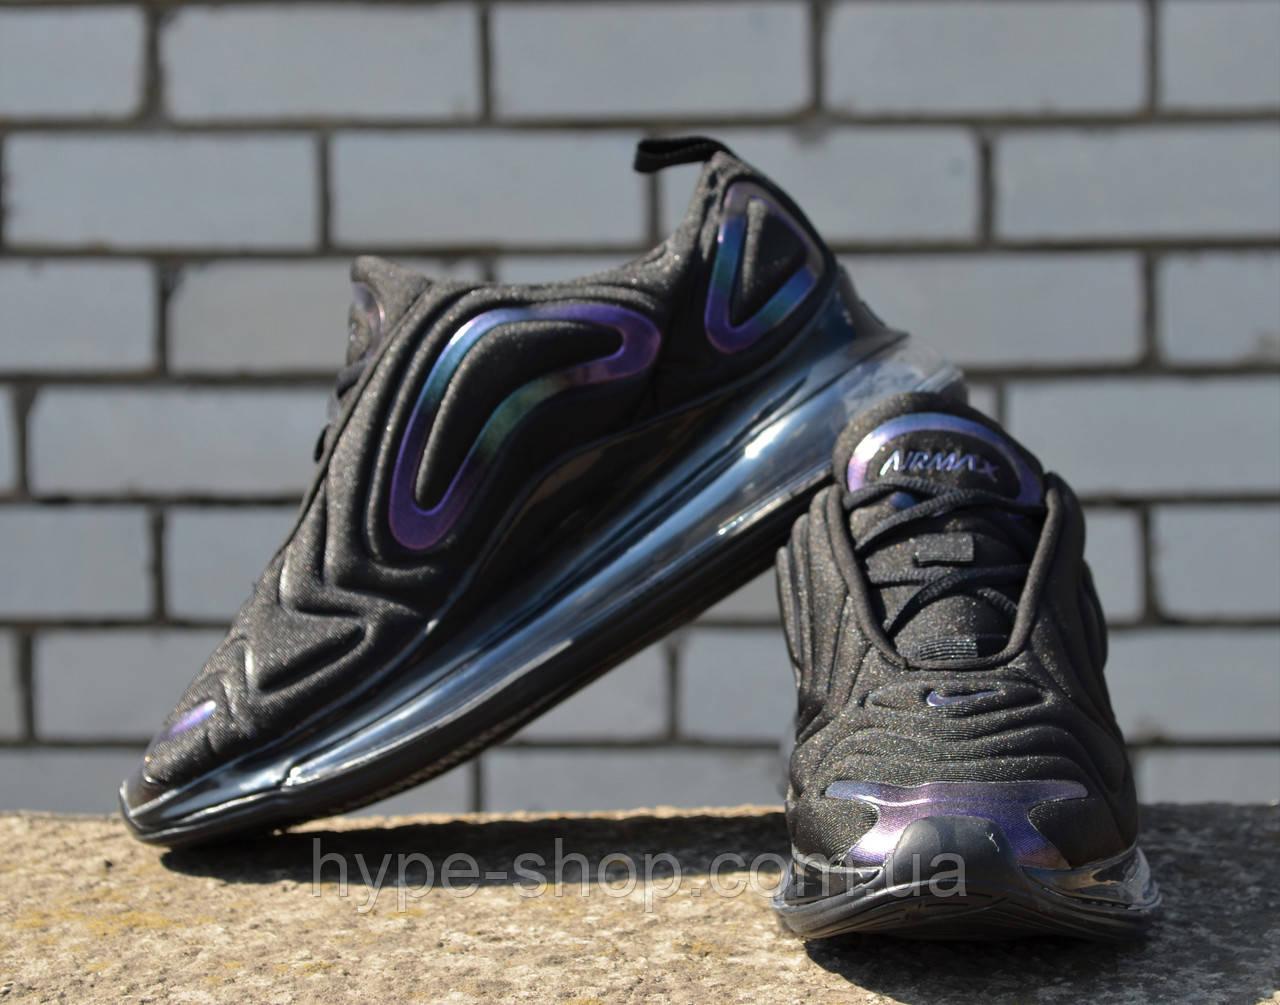 Мужские Кроссовки Nike Air Max 720 реплика